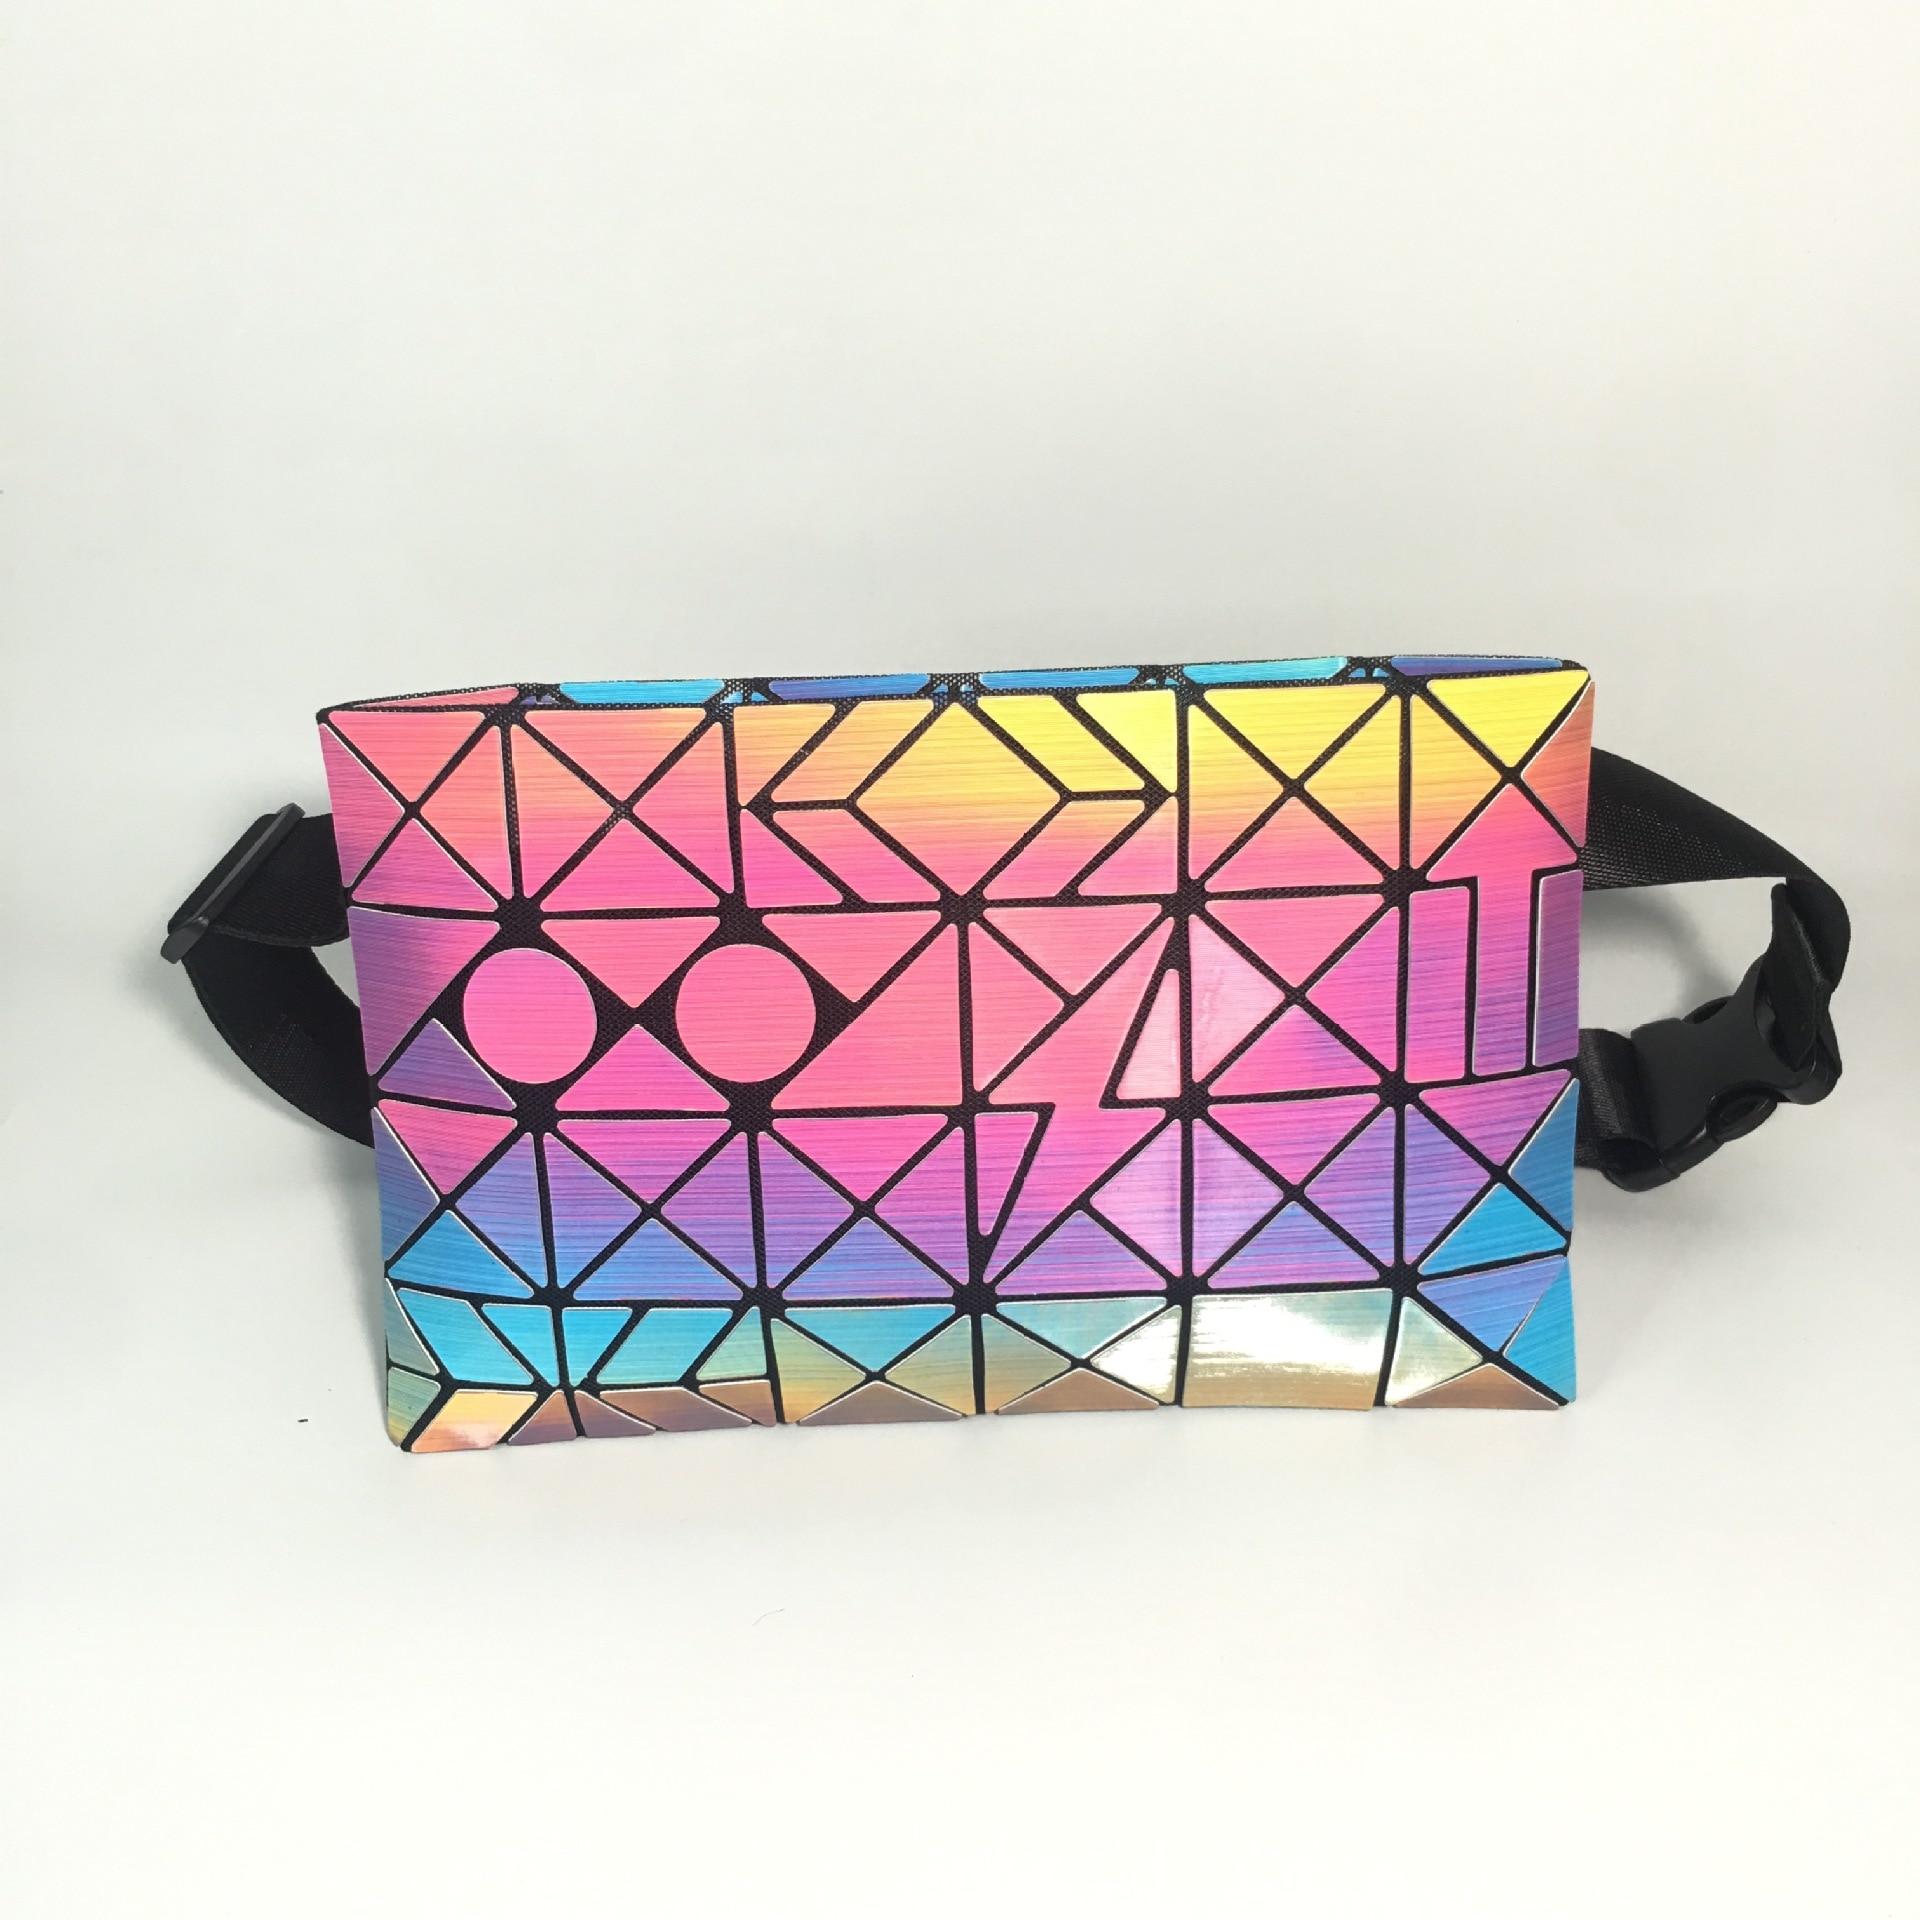 2020 Hot 3D Rainbow Laser Sports Women's Waist Bag Irregular Geometric Cell-phone Chest Bag Cube Diamond Grid Pattern Small Bags